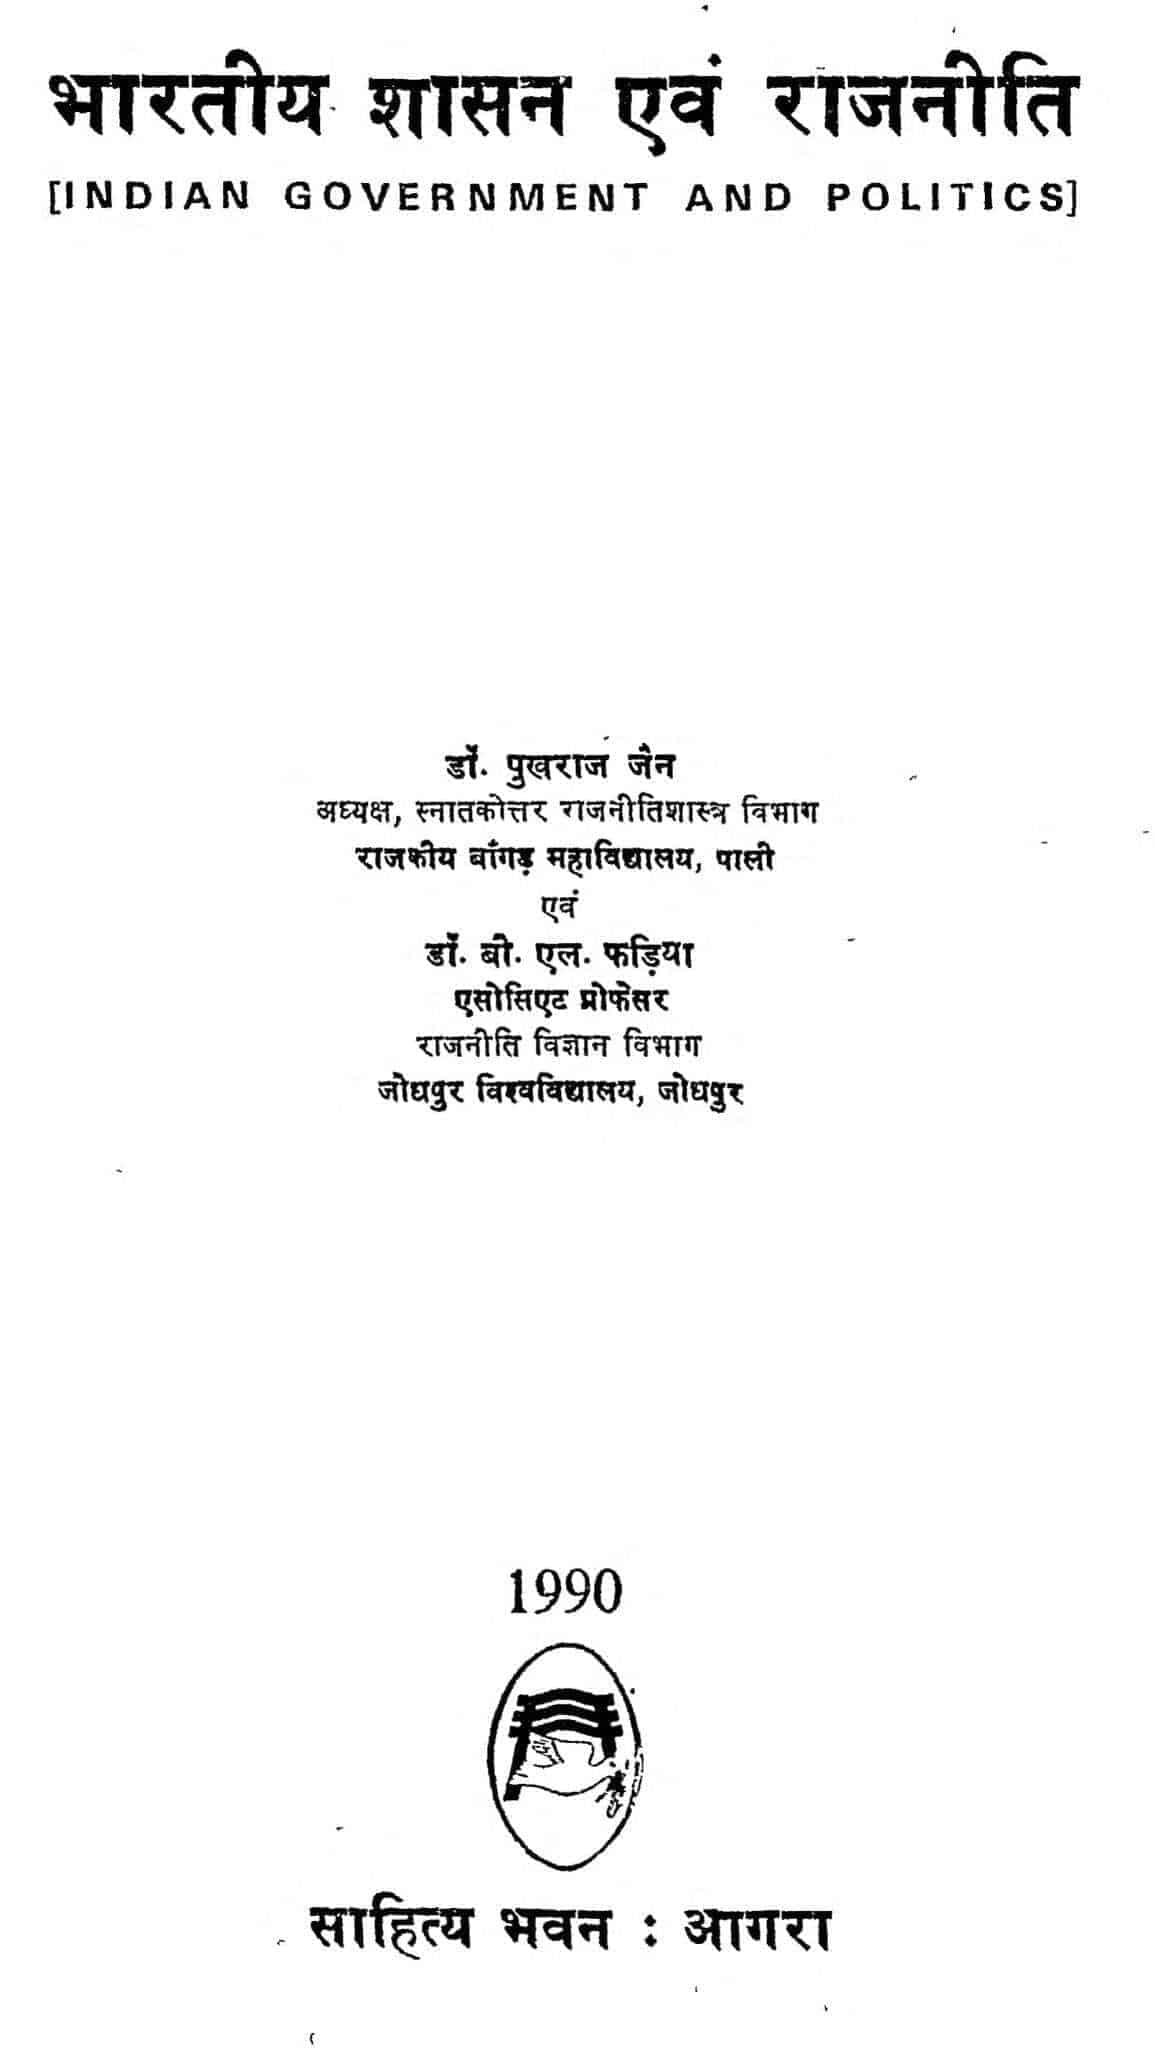 Book Image : भारतीय शासन एवं राजनीति  - Bhartiya Shasan Evam Rajniti